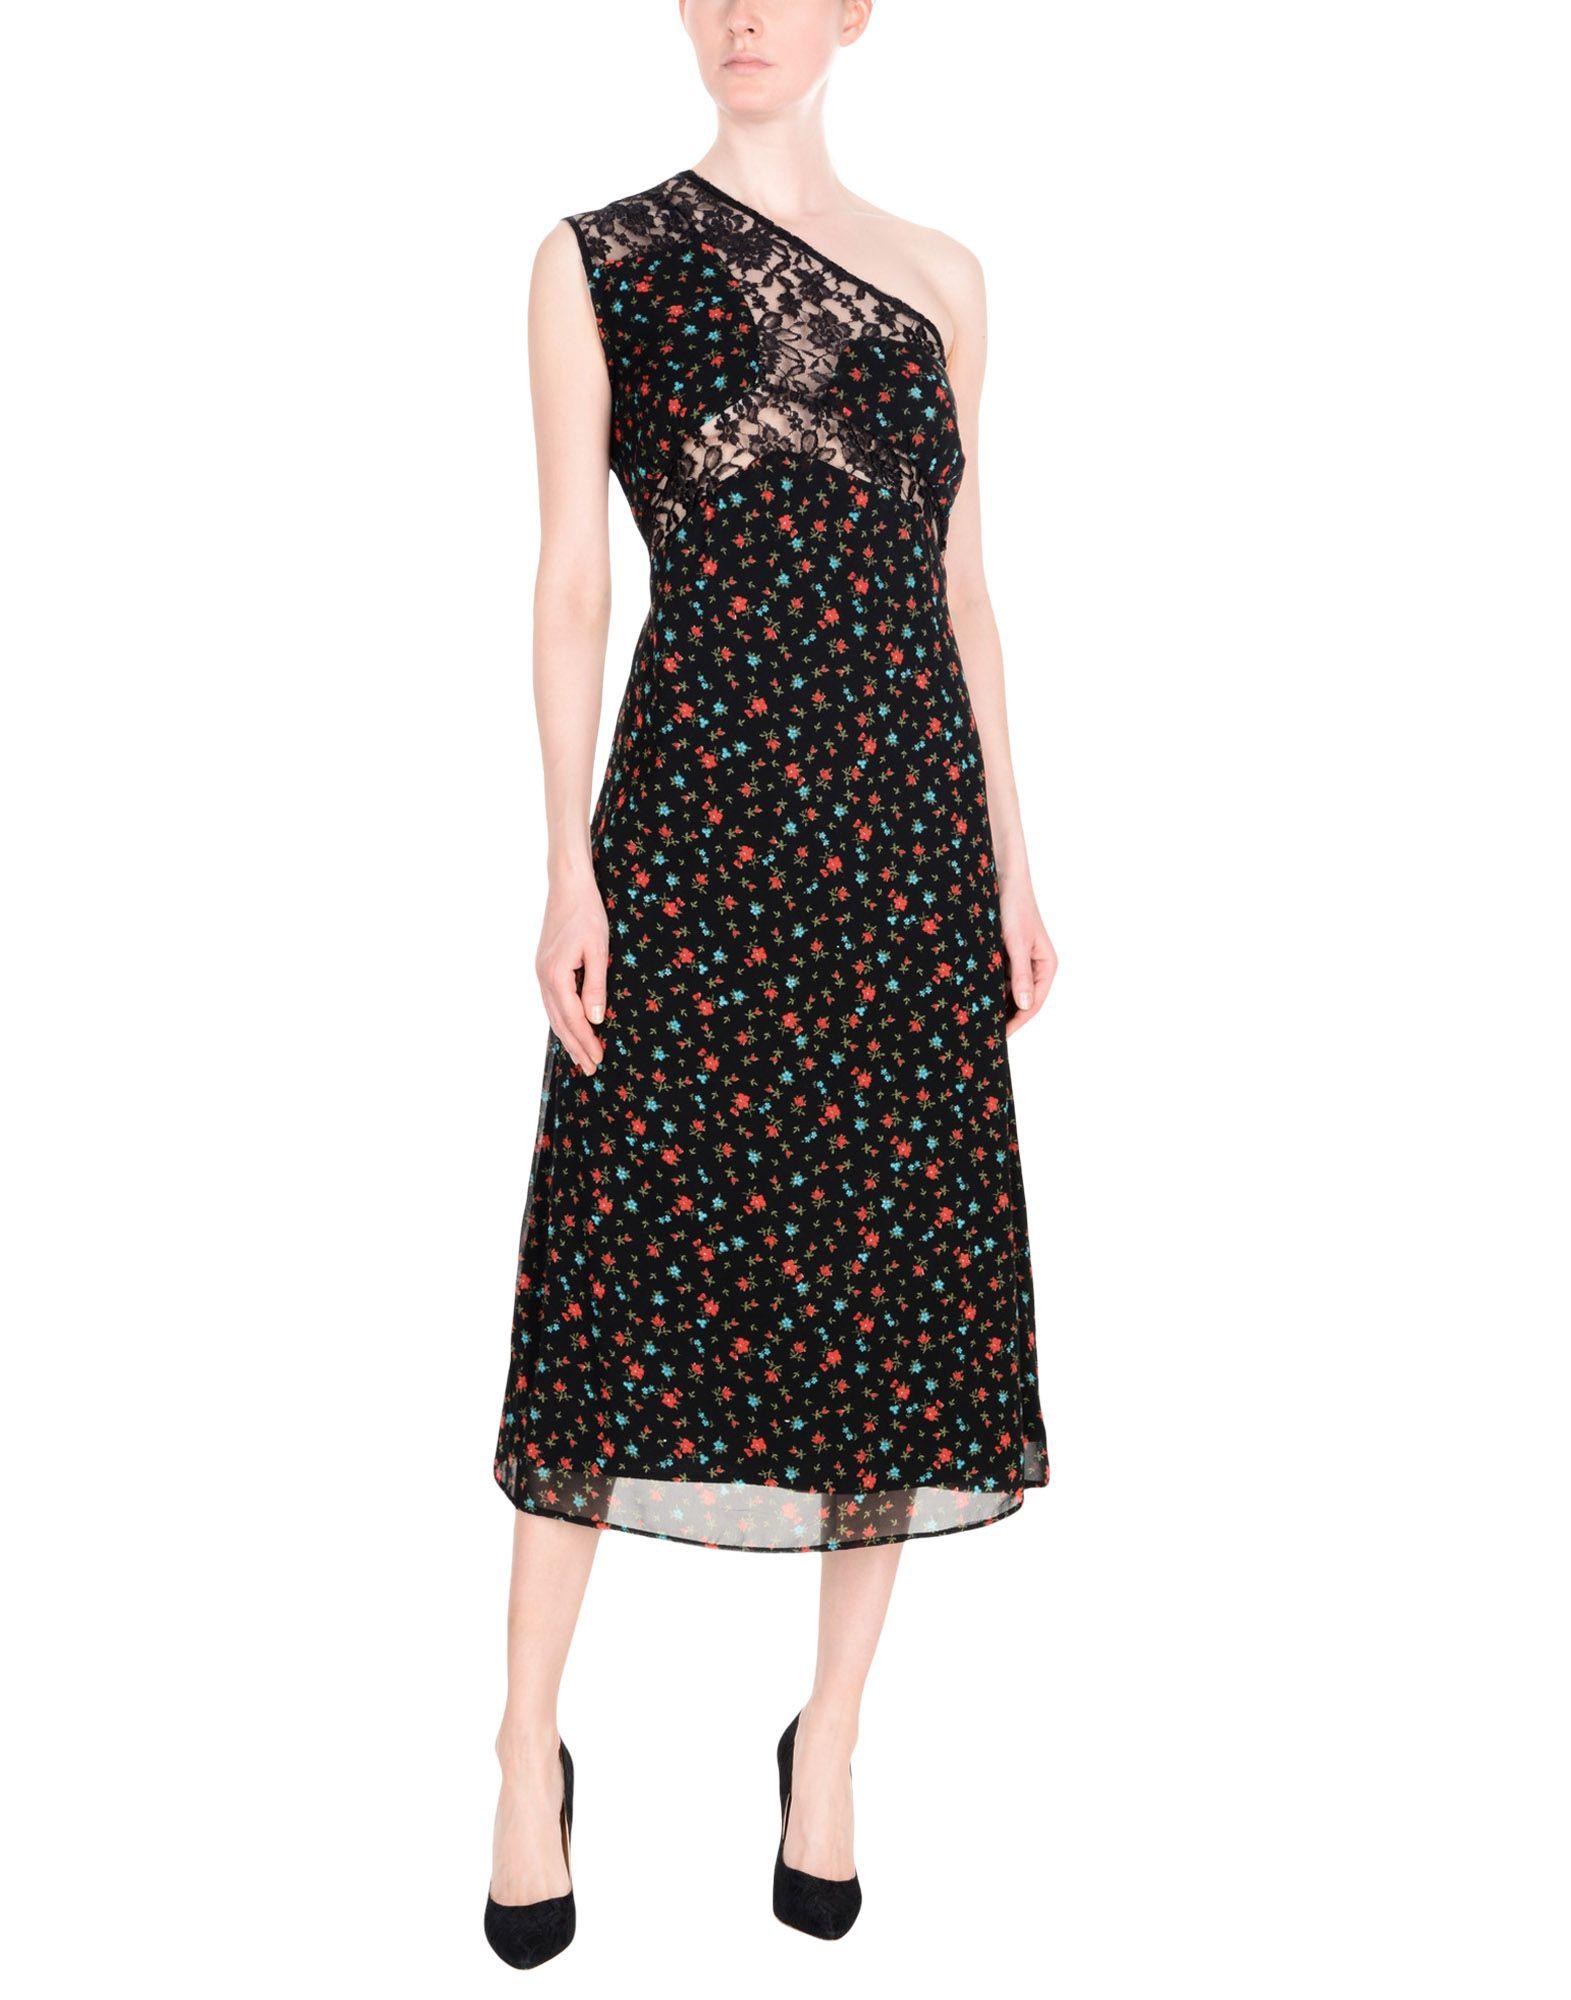 WALTER BABINI Платье длиной 3/4 платье walter babini